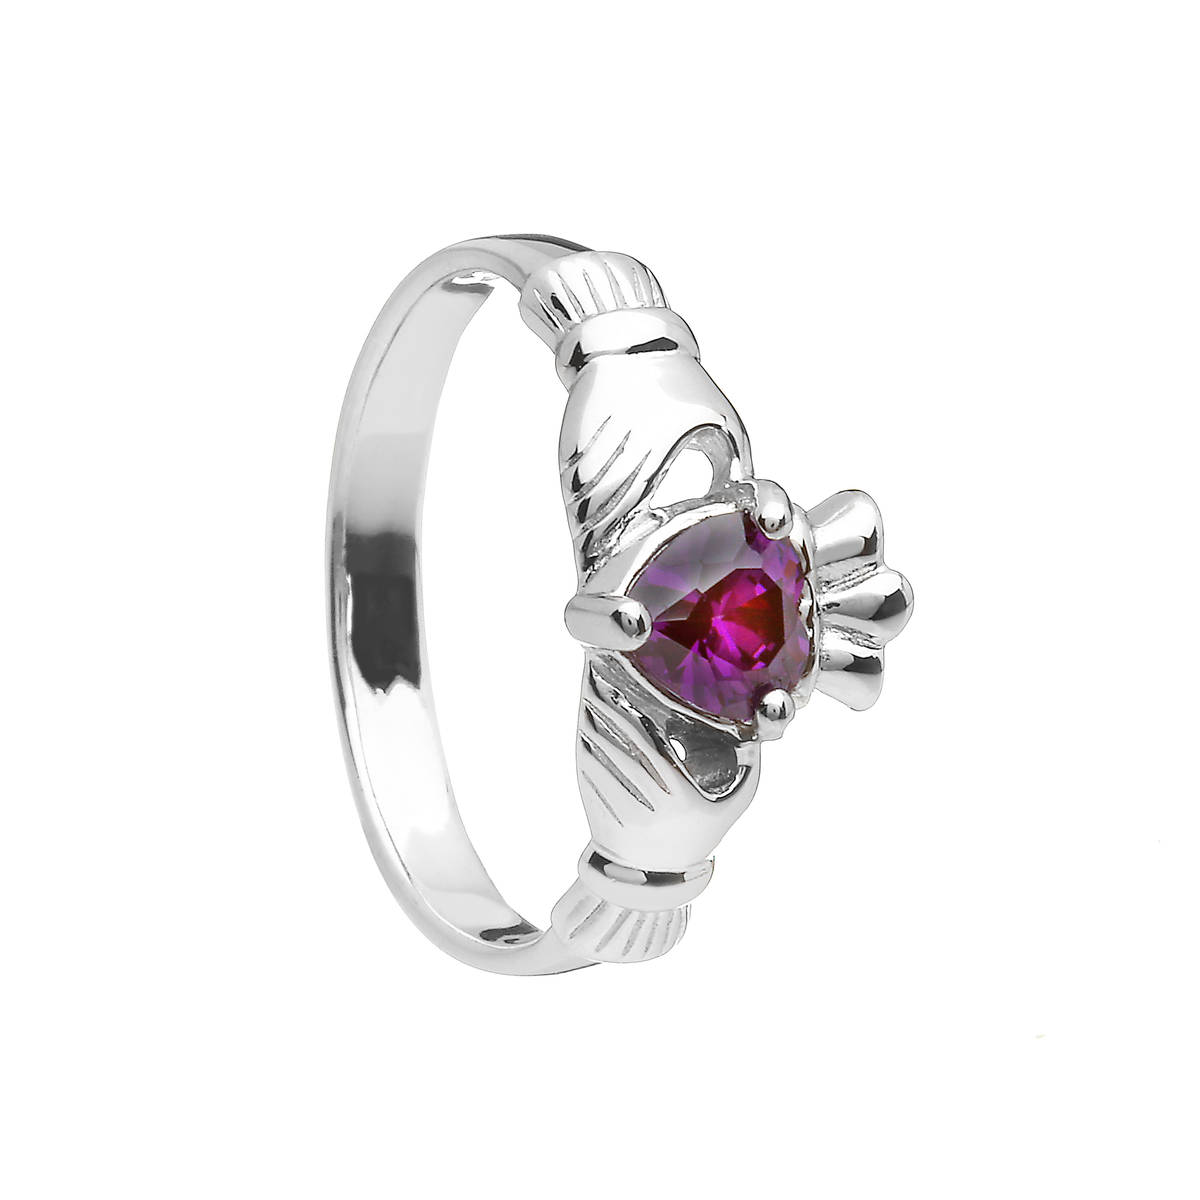 Sterling Silver Classic February Birthstone Claddagh Ring